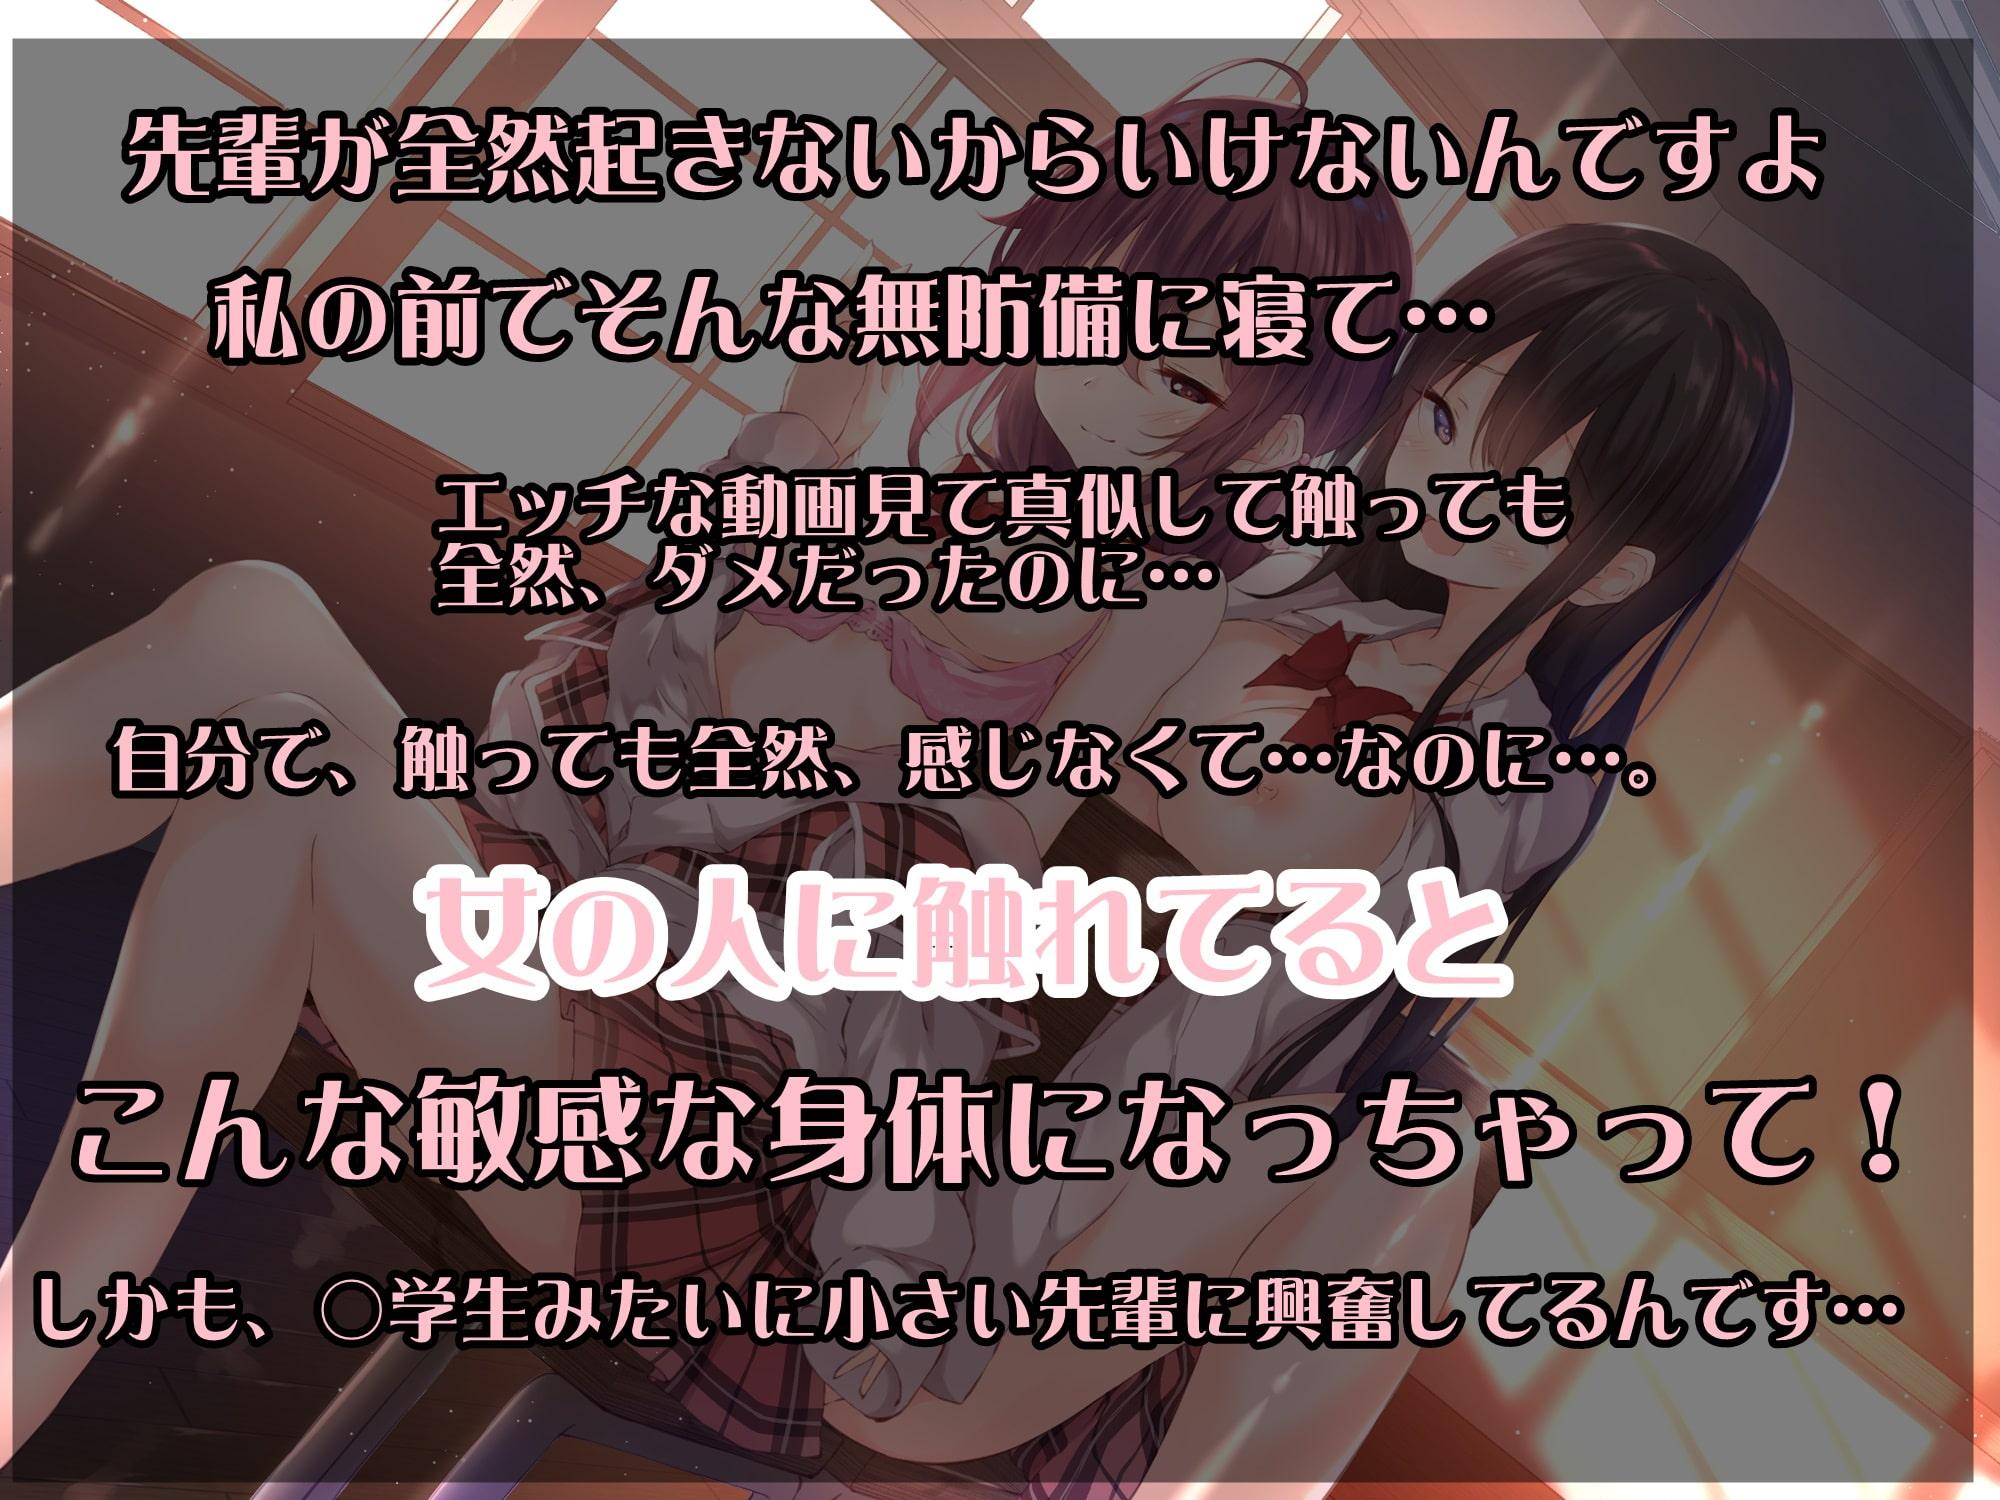 [Binaural Yuri] Super-sensitive Kohai Uses Her Senpai's Body to Masturbate!?